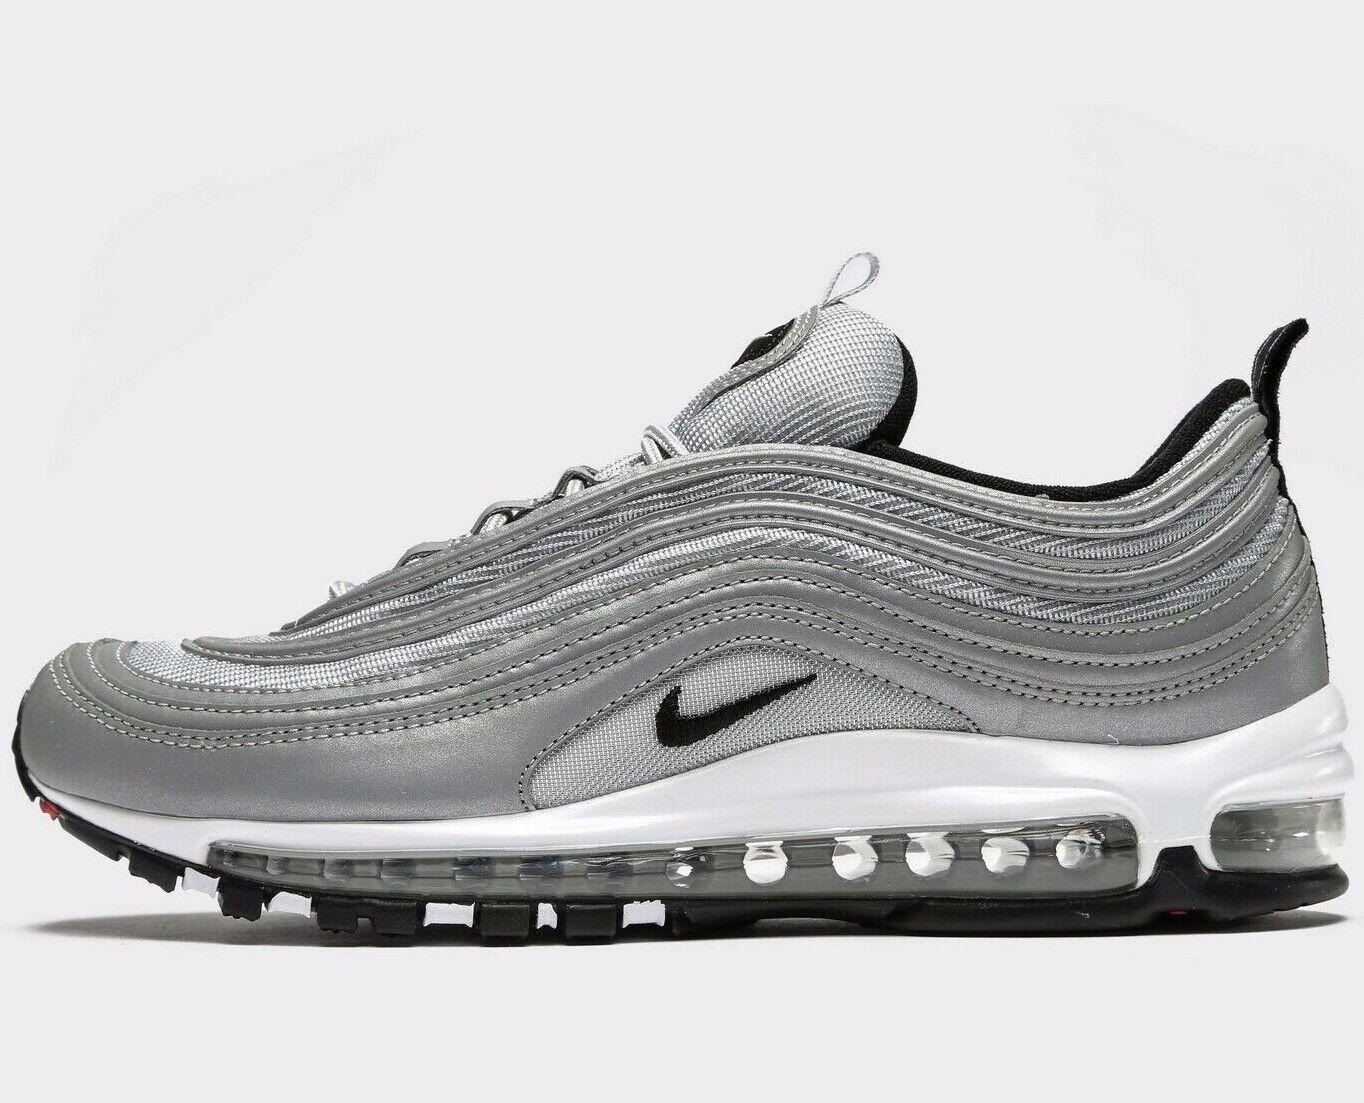 Authentic Nike Air Max 97 Premium ® ( Men Größes UK  7.5 & 13 ) Metallic Silber